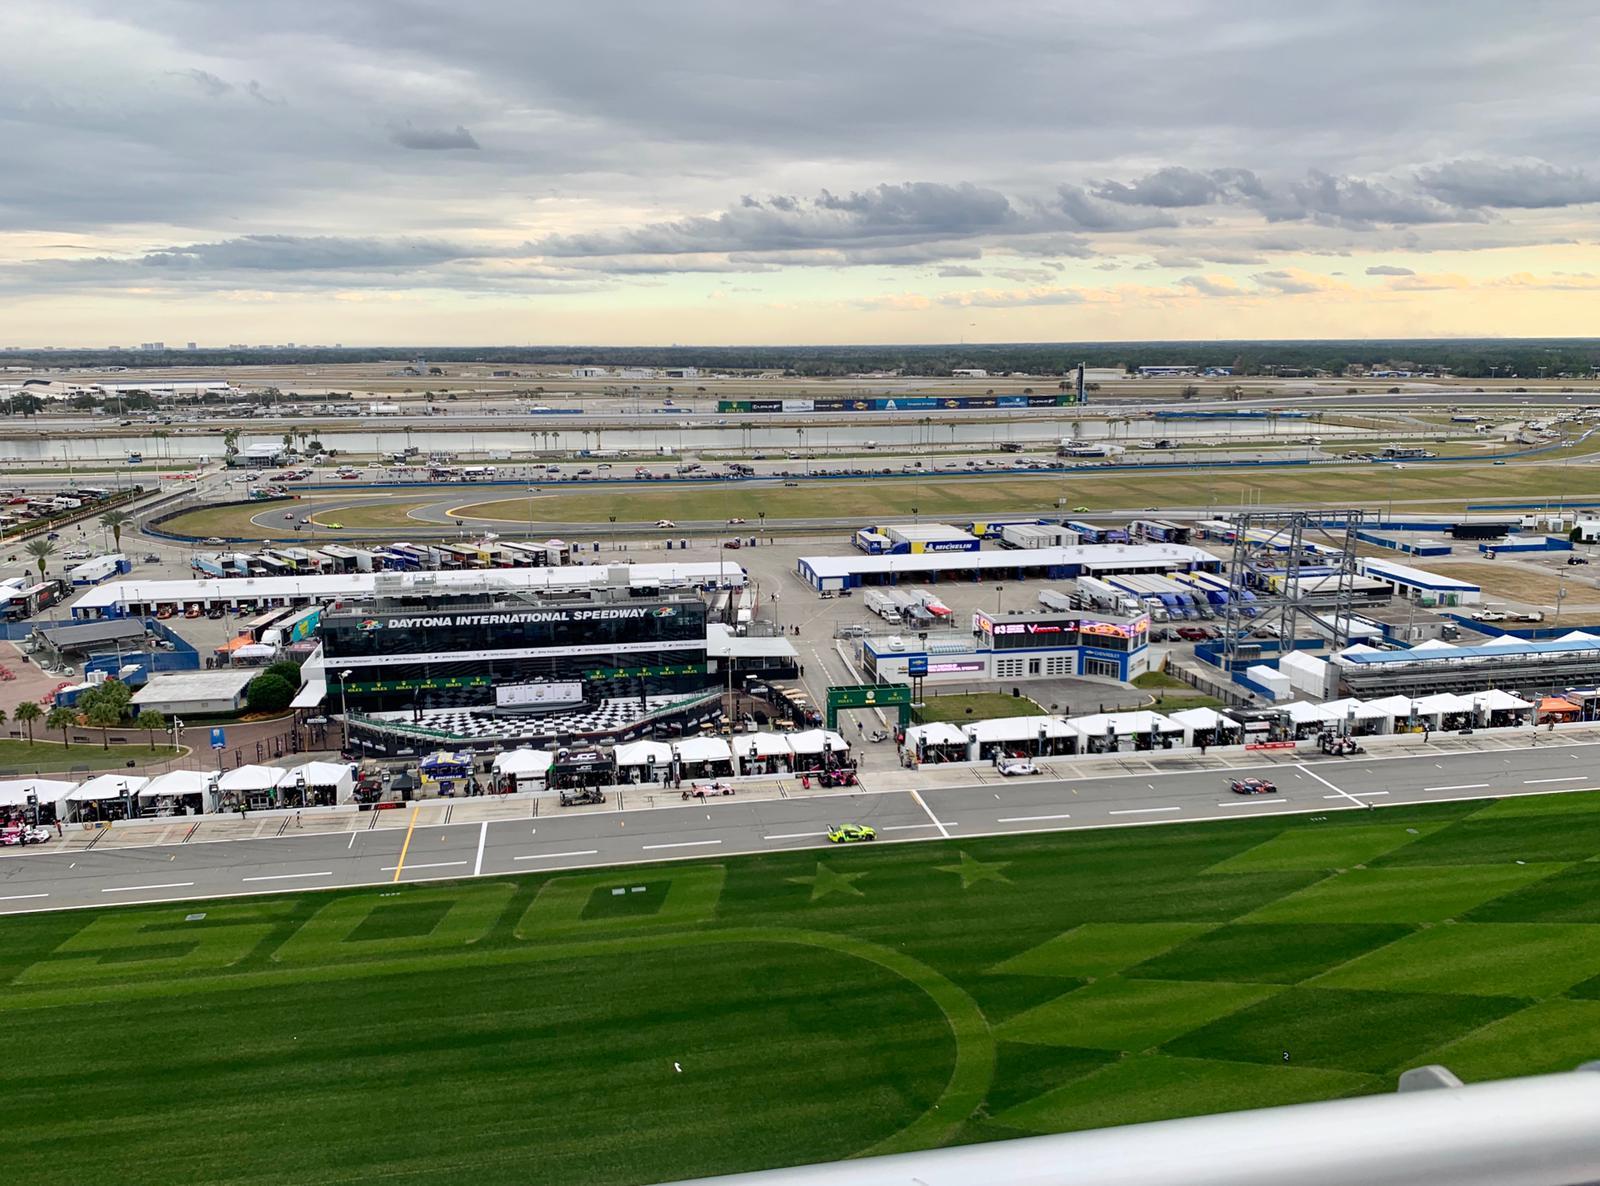 Overlooking Daytona International Speedway never gets old!